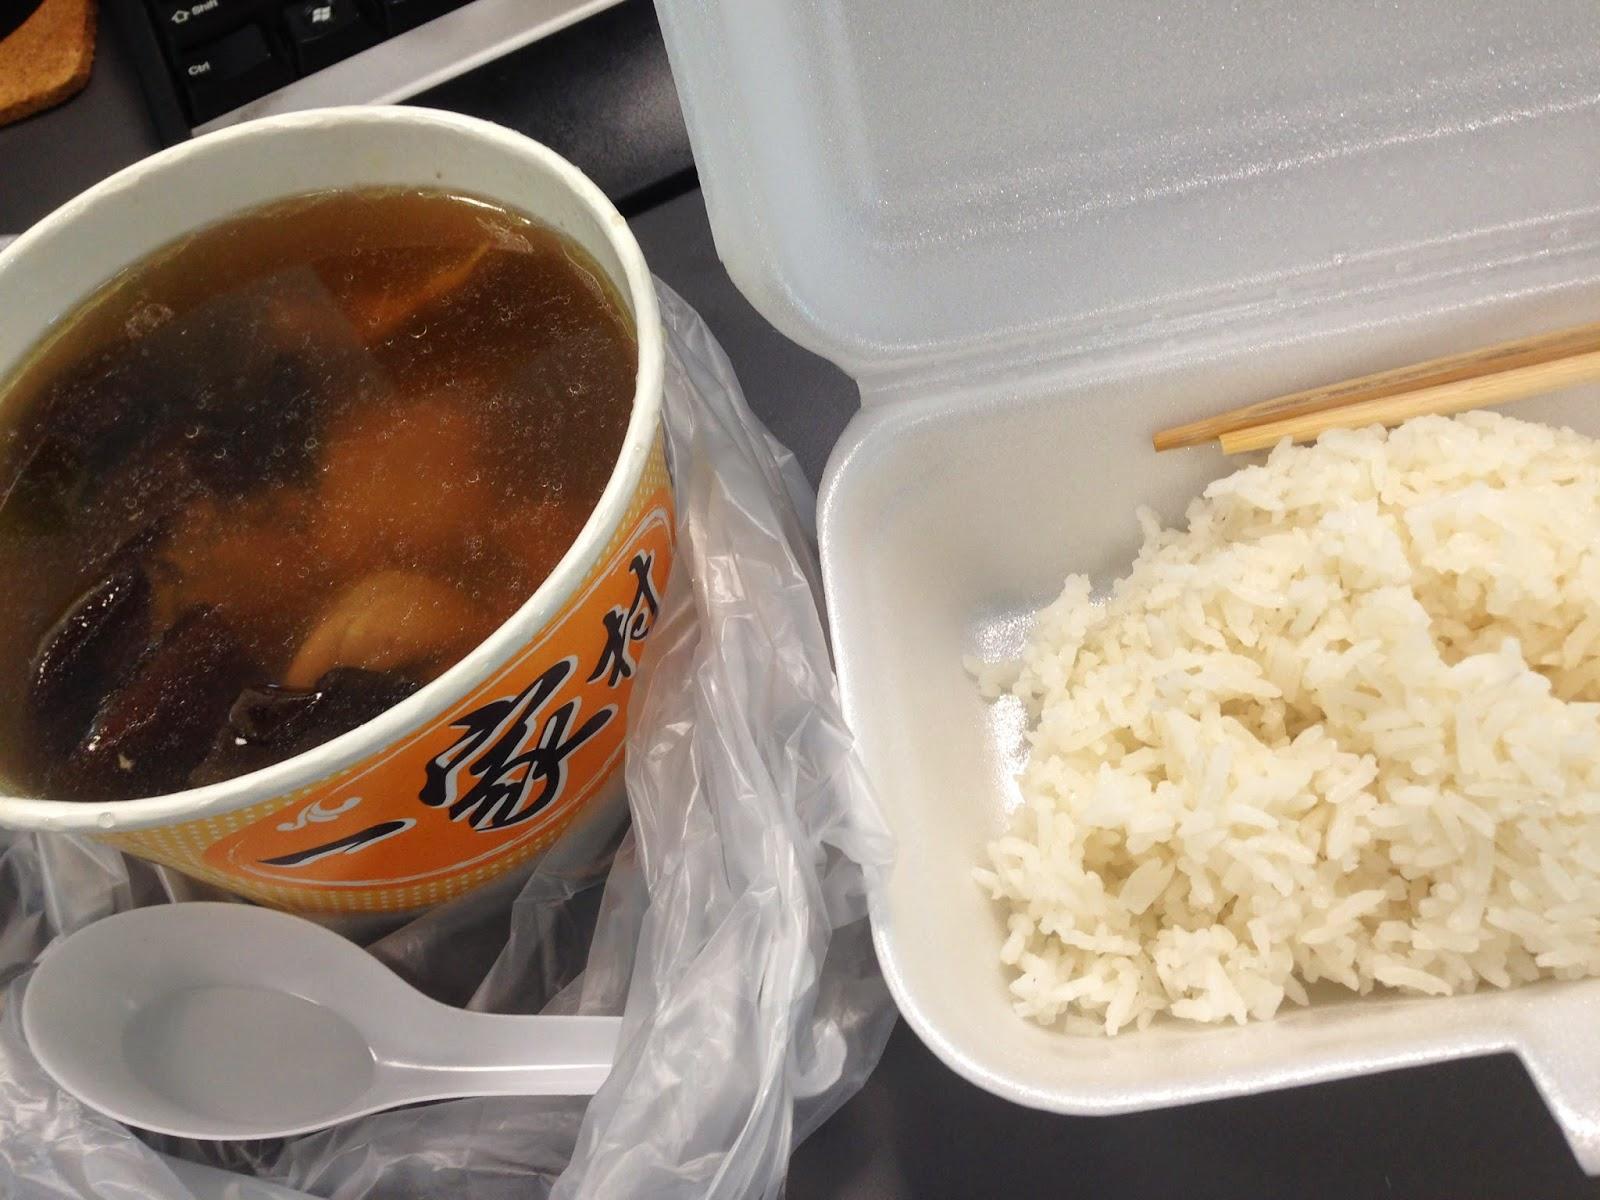 Yi Jia Chun, black fungus mushroom soup